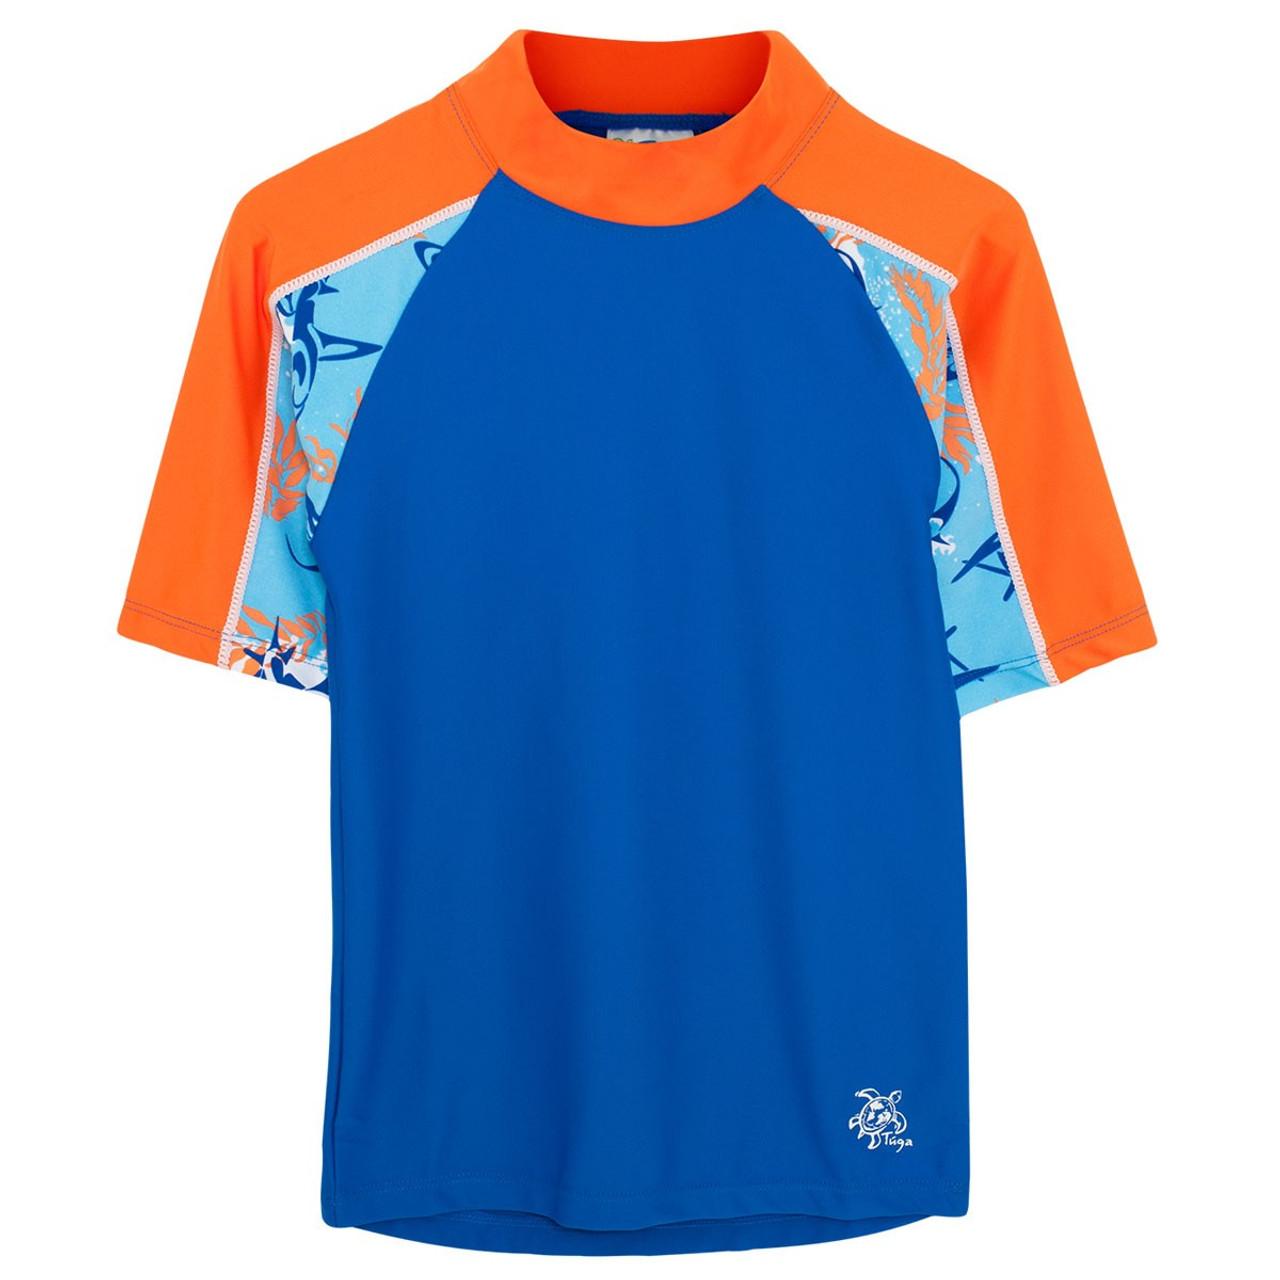 3faf2dffab887 Boys Tuga Short Sleeve Swim Shirt 'Breaker' Fuego | Boys UV Clothing